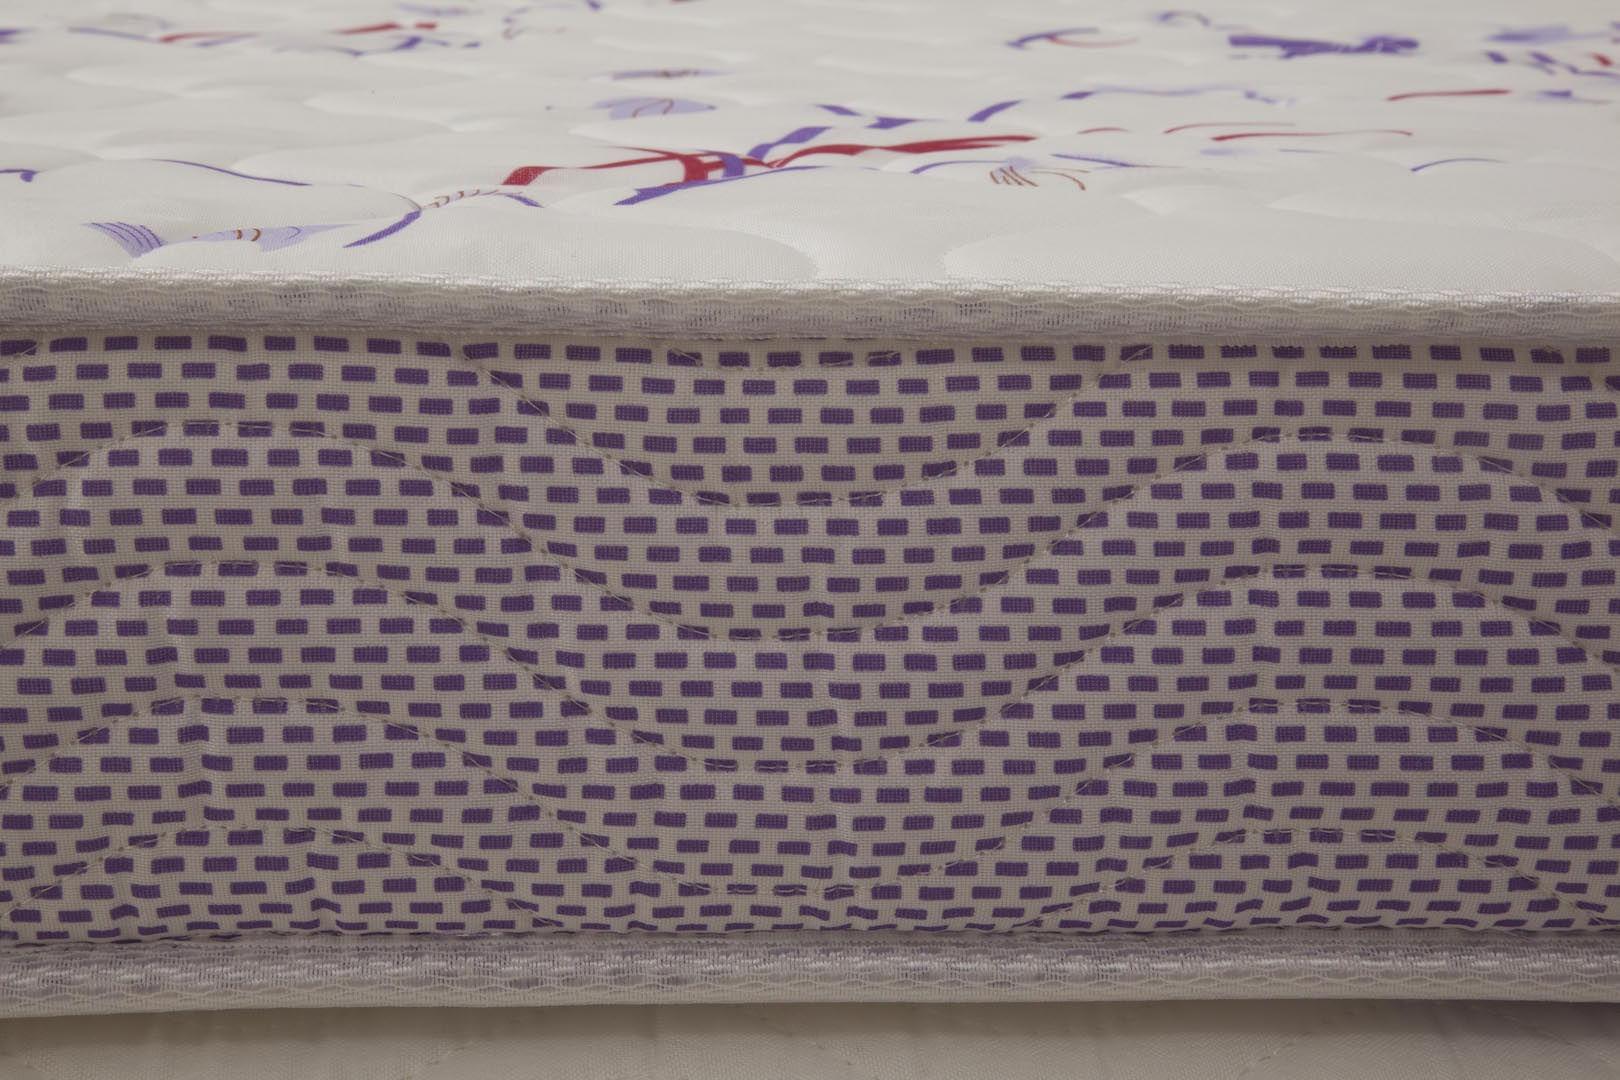 Colchao Physical Resistente Medio Solteiro 88 cm (LARG) Branco - 42936